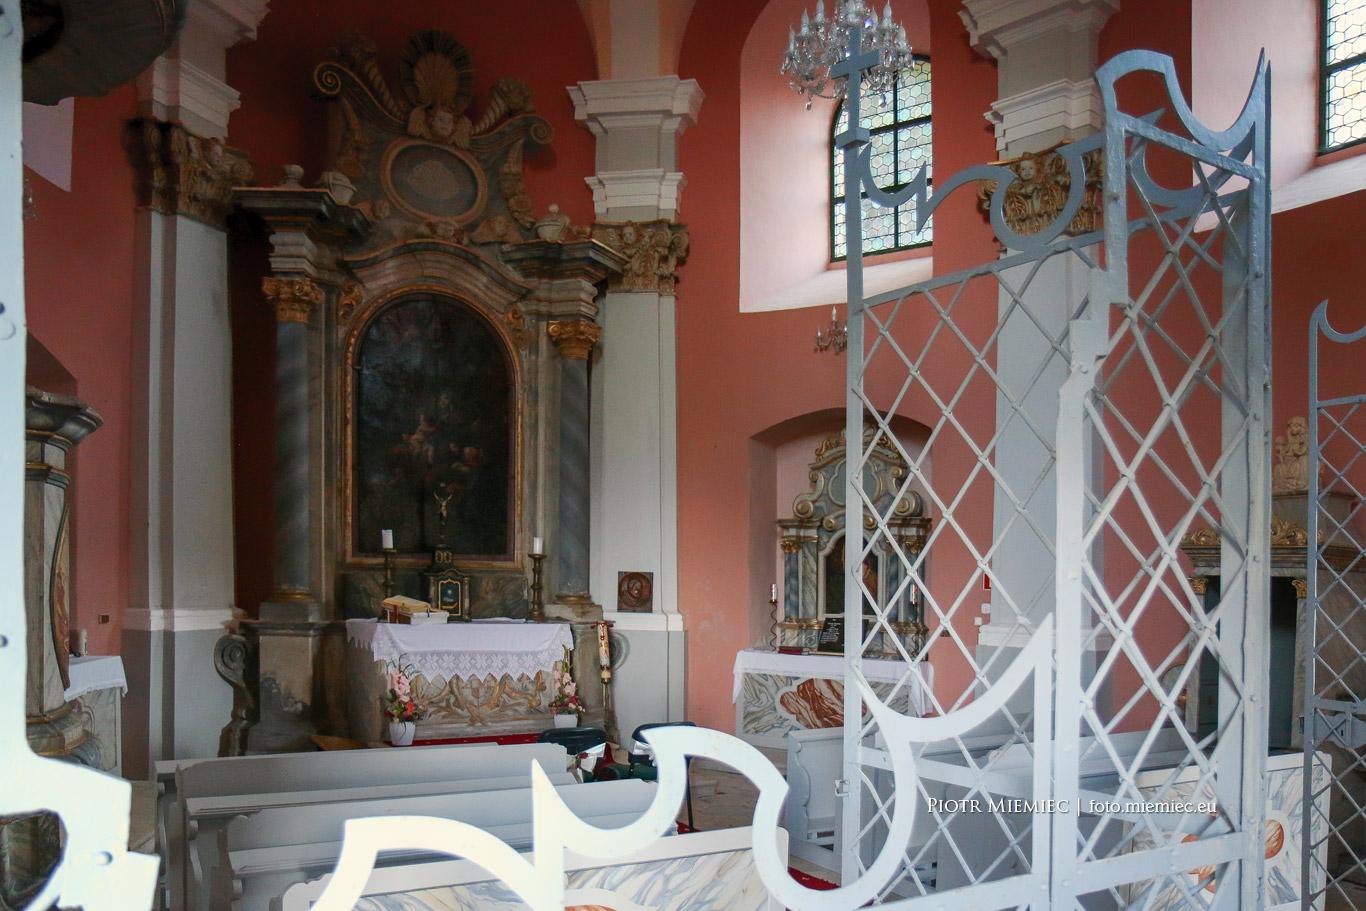 Kaplica pw. św. Anny Karkonosze